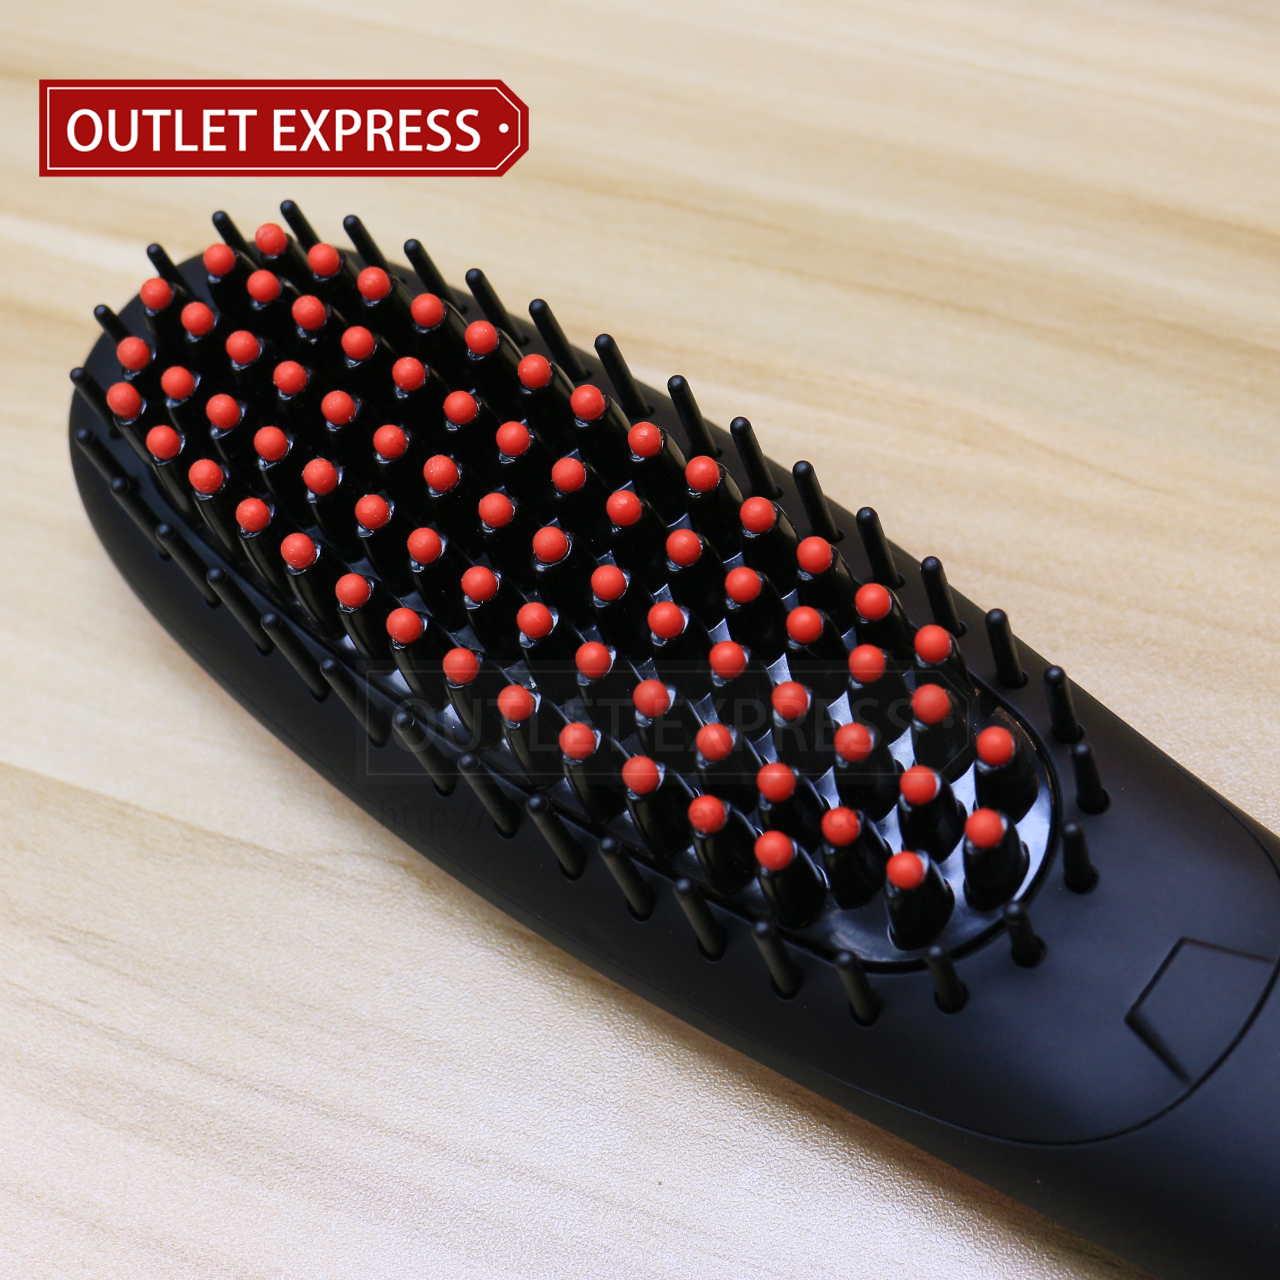 NASV-300 負離子直髮梳 梳,- Outlet Express HK 生活百貨城實拍相片